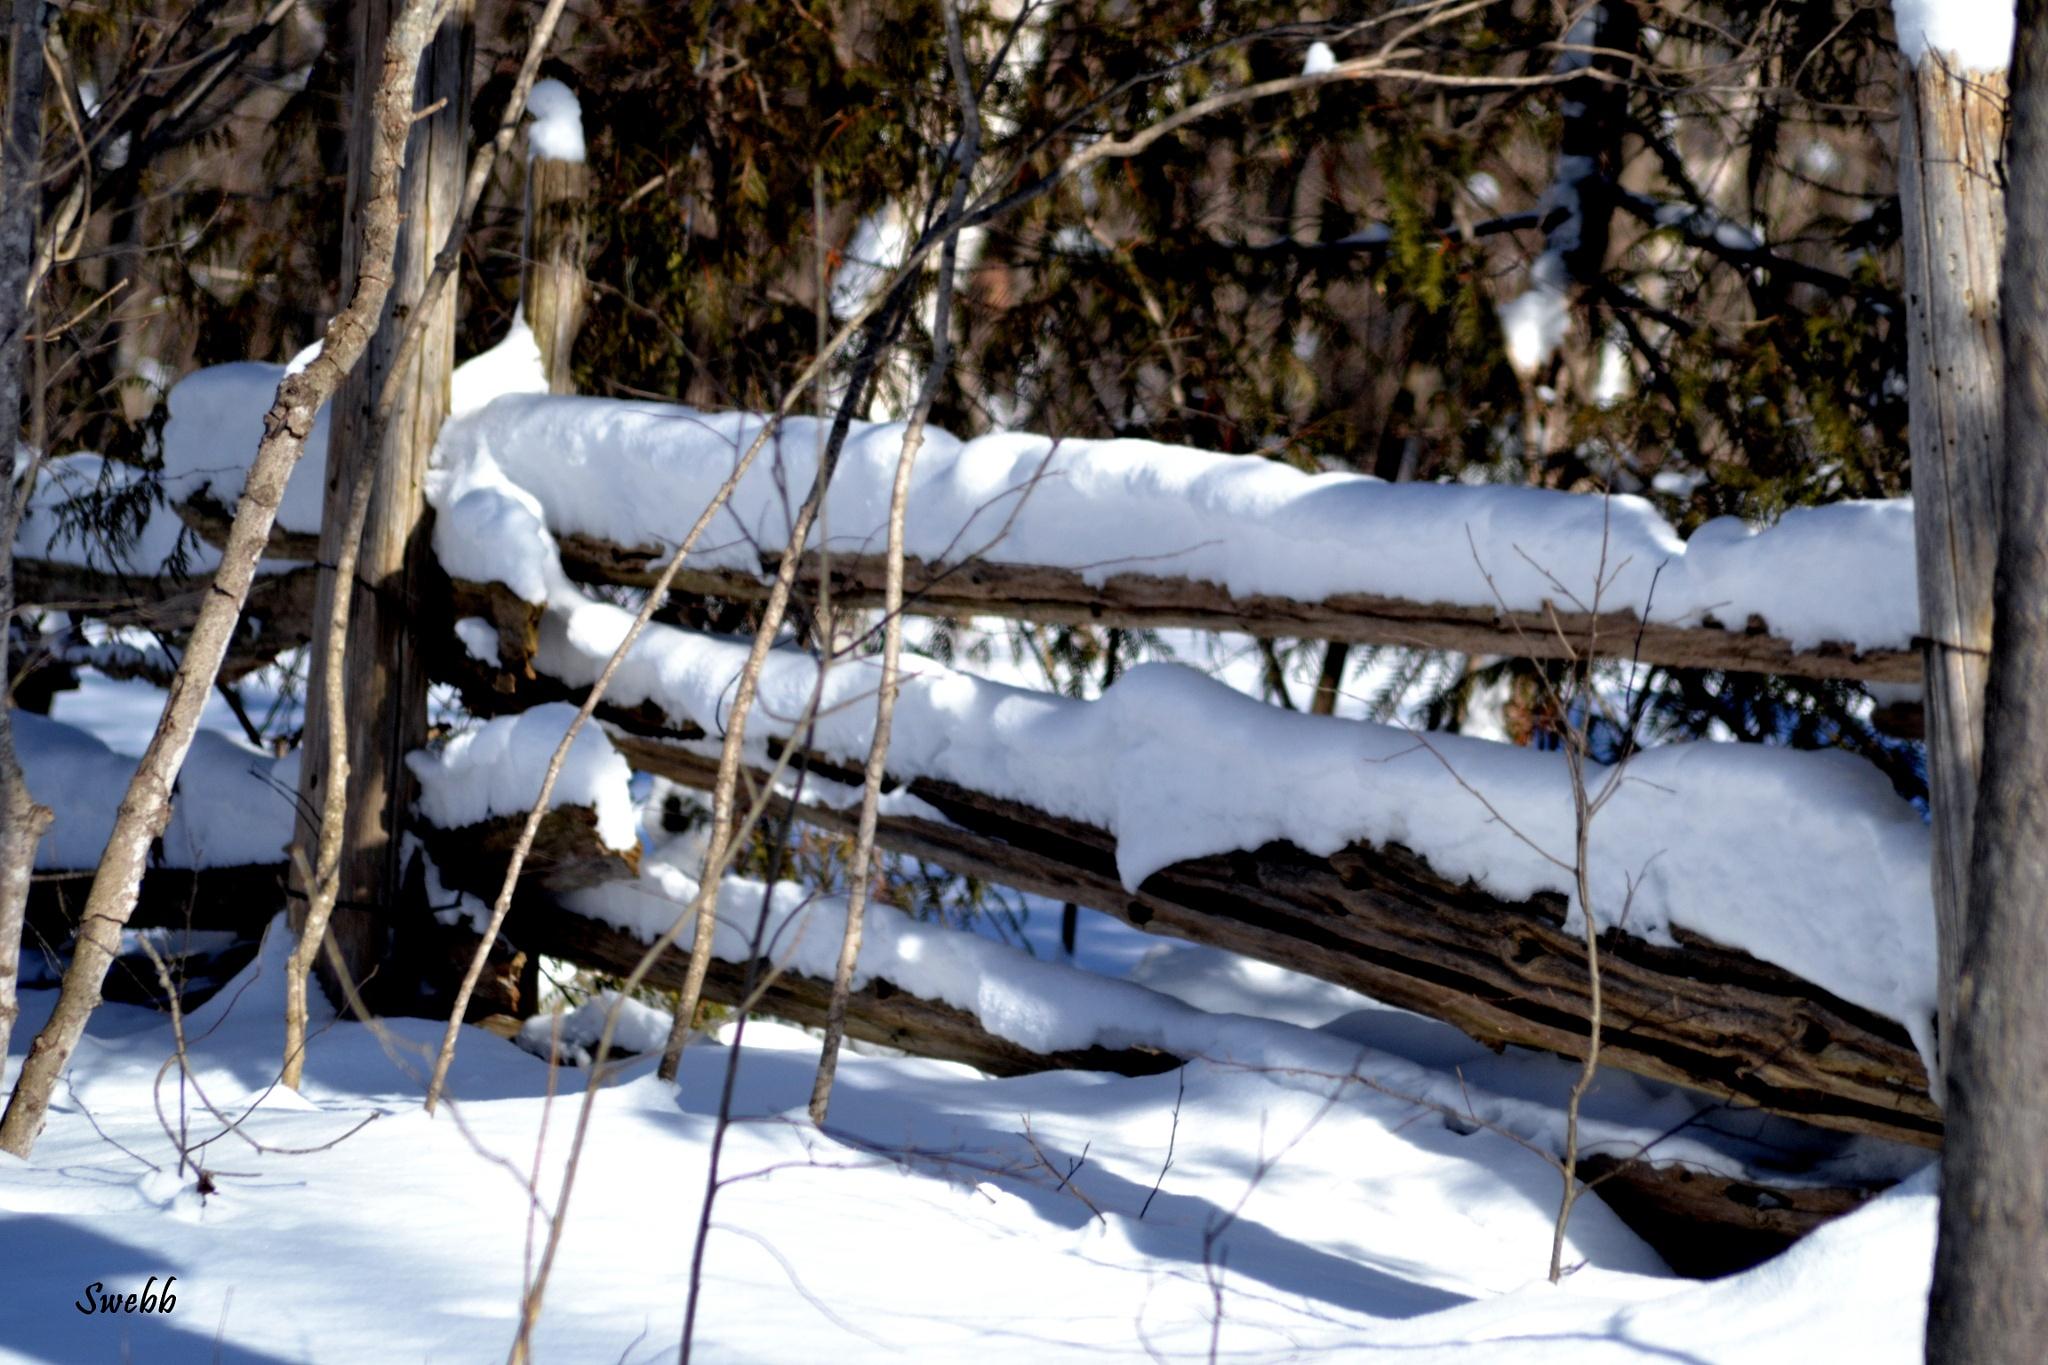 Snow Fence by Steve Webb